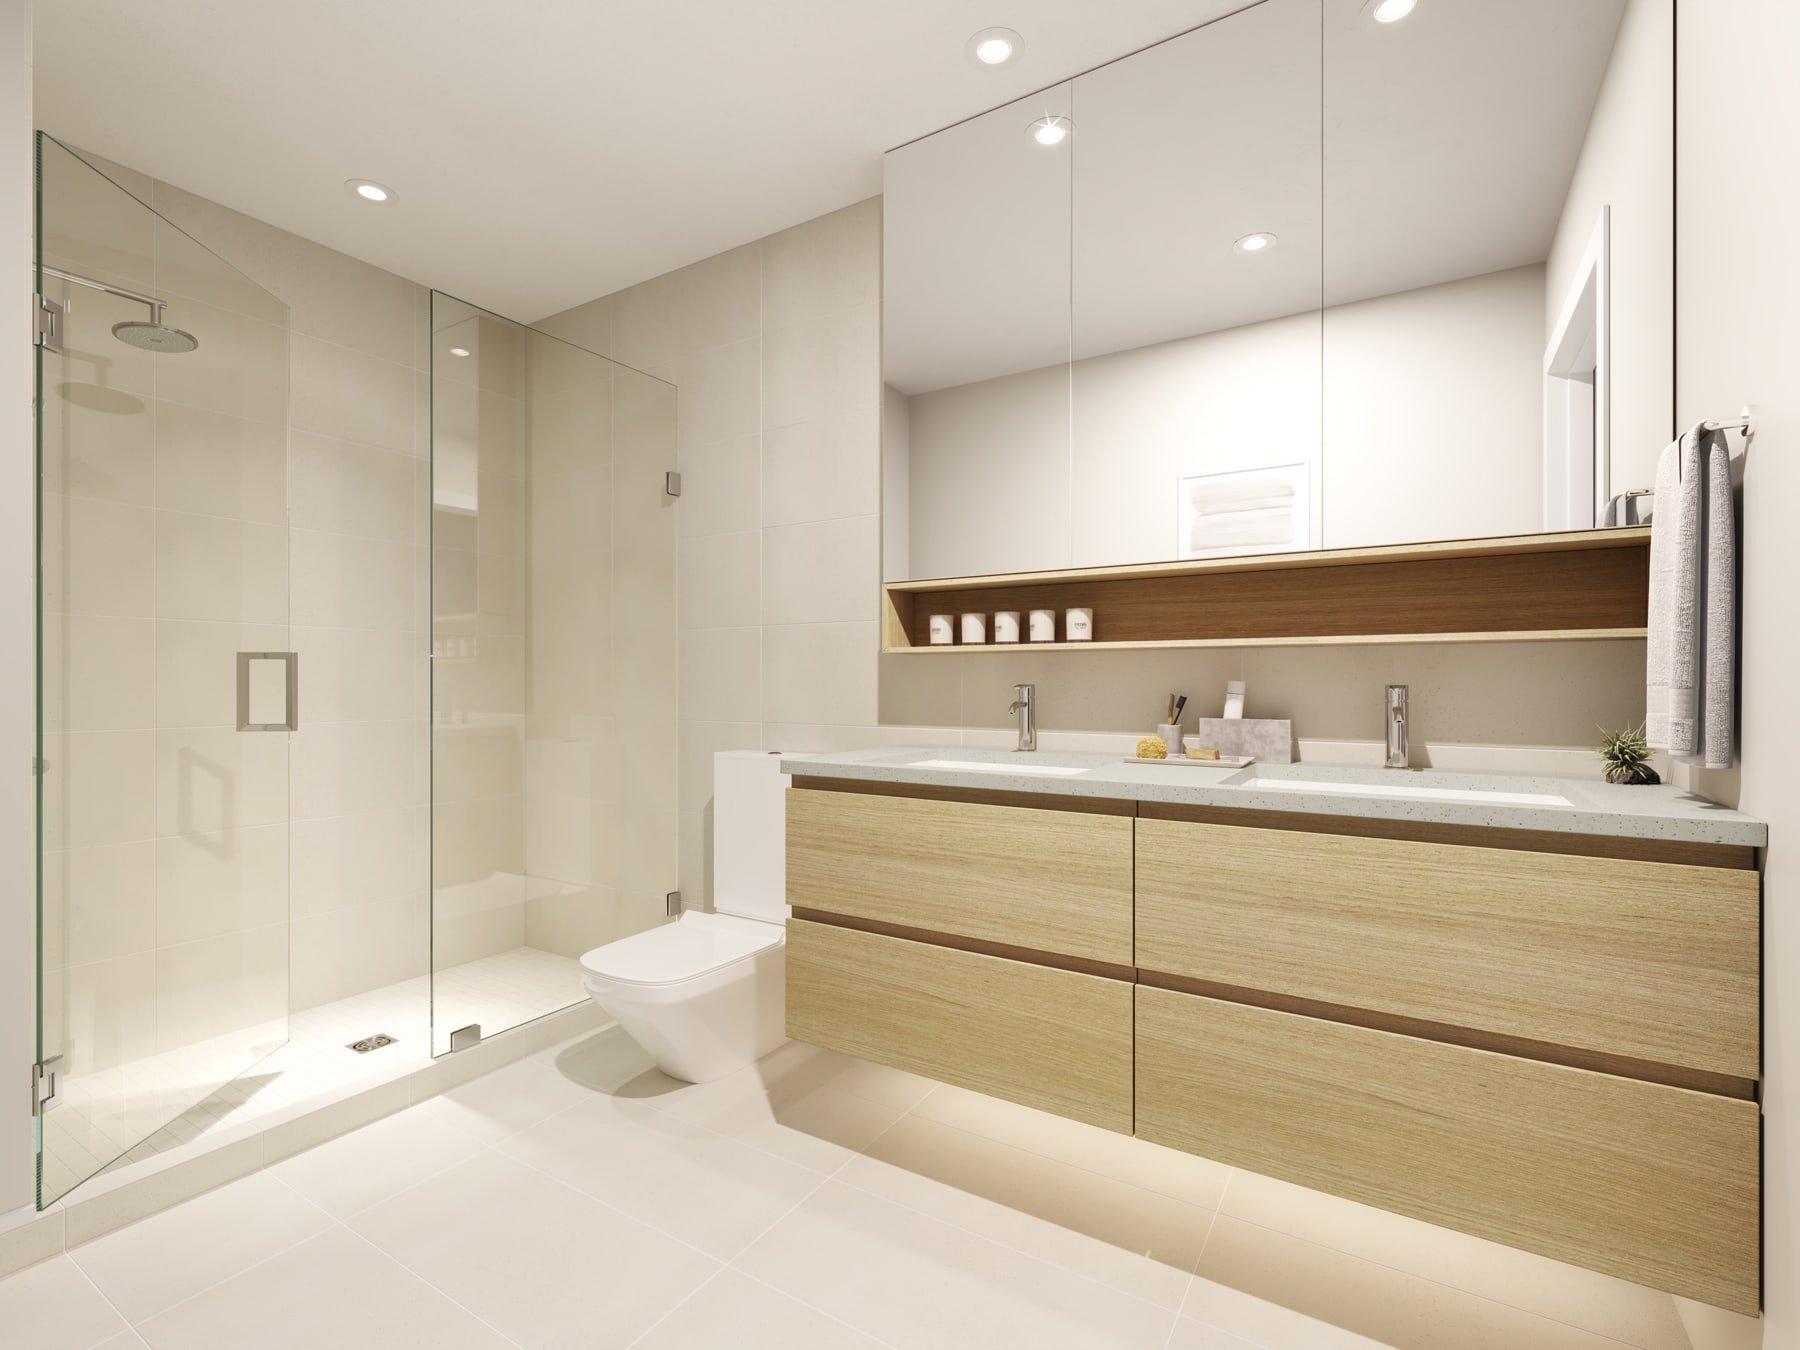 Bathroom - 188 West King Edward Ave, Vancouver, BC V5Y 2H9, Canada!